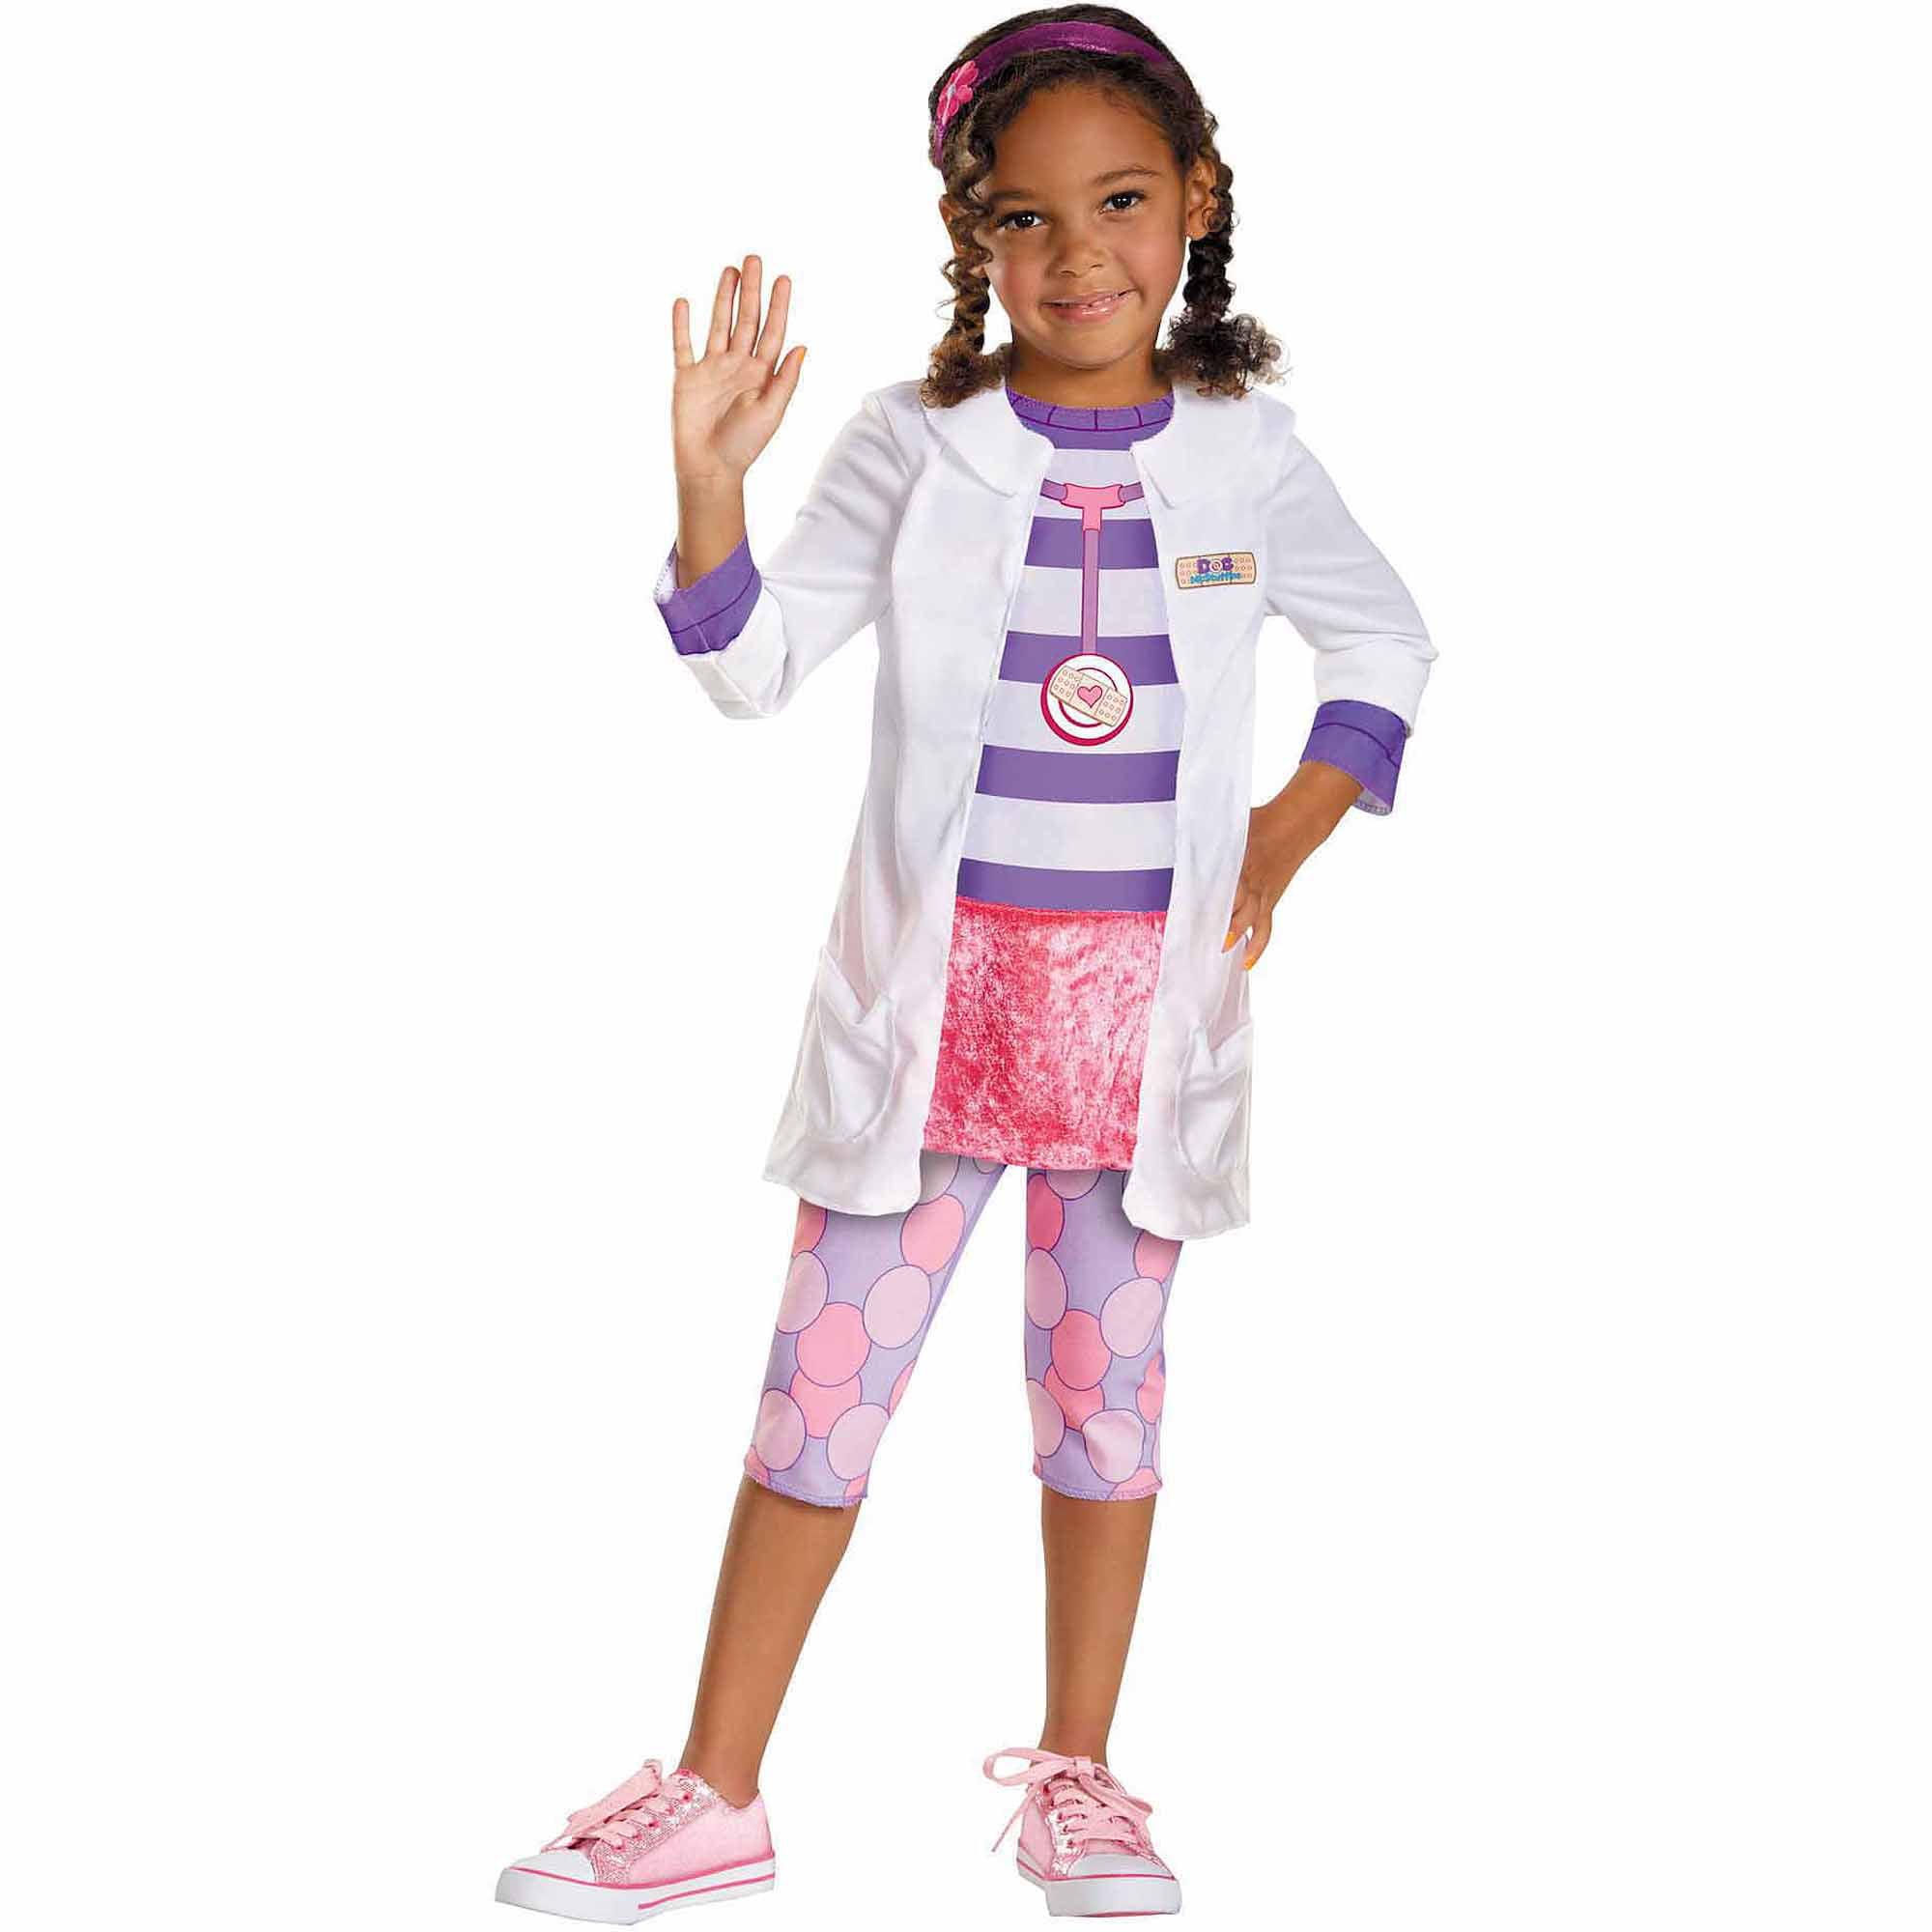 doc mcstuffins child halloween costume s 4 6 walmartcom - Doc Mcstuffins Halloween Bag